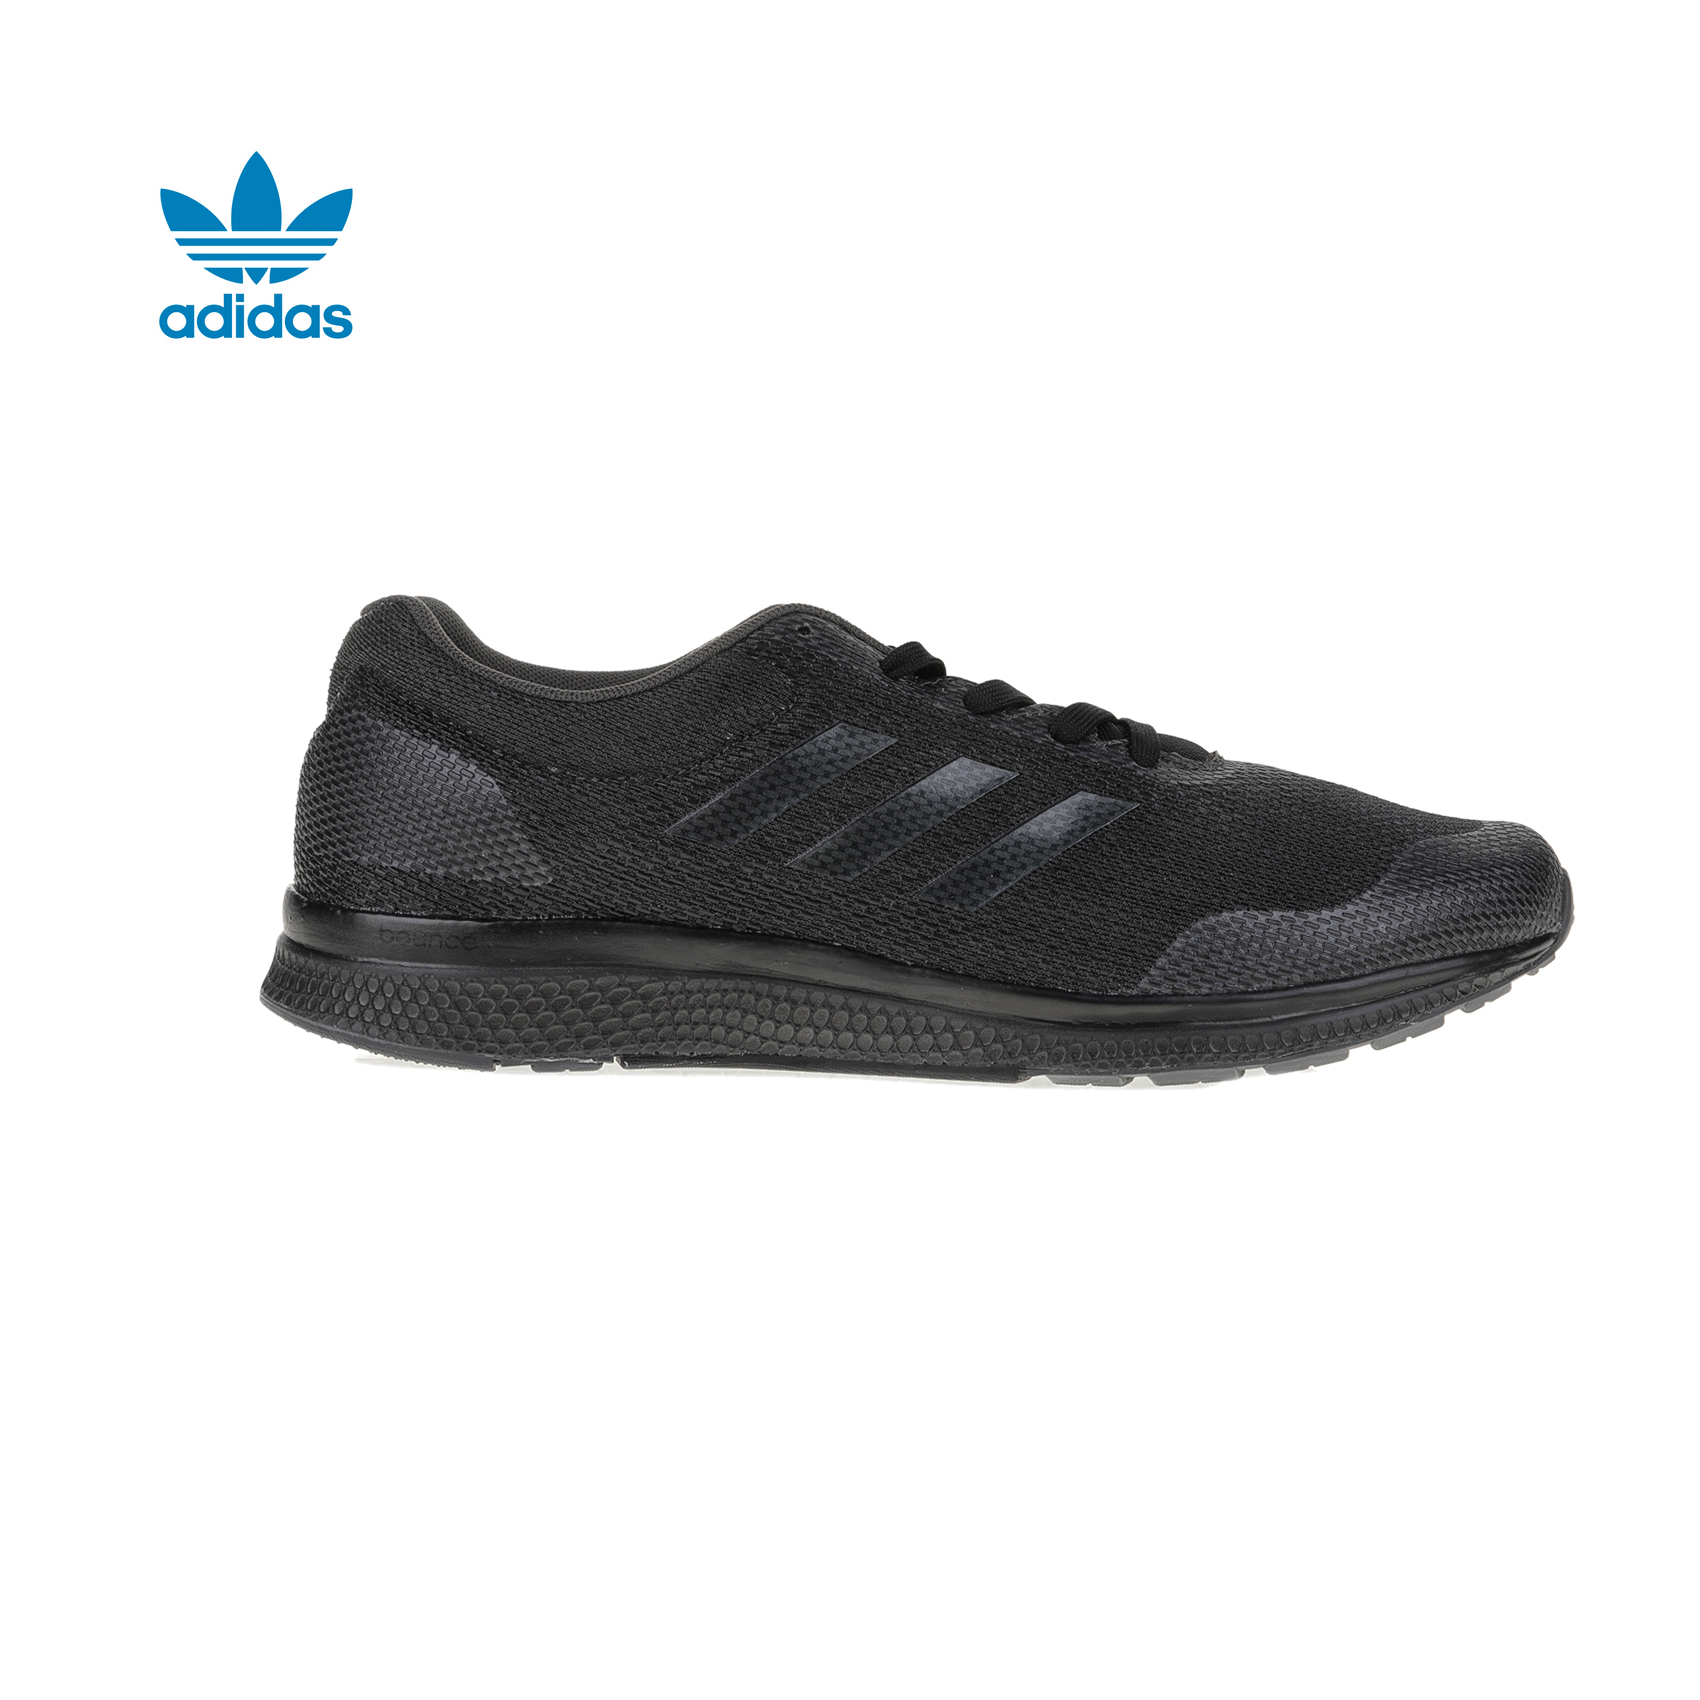 adidas Originals - Ανδρικά παπούτσια adidas mana bounce 2 aramis μαύρα ανδρικά παπούτσια αθλητικά running